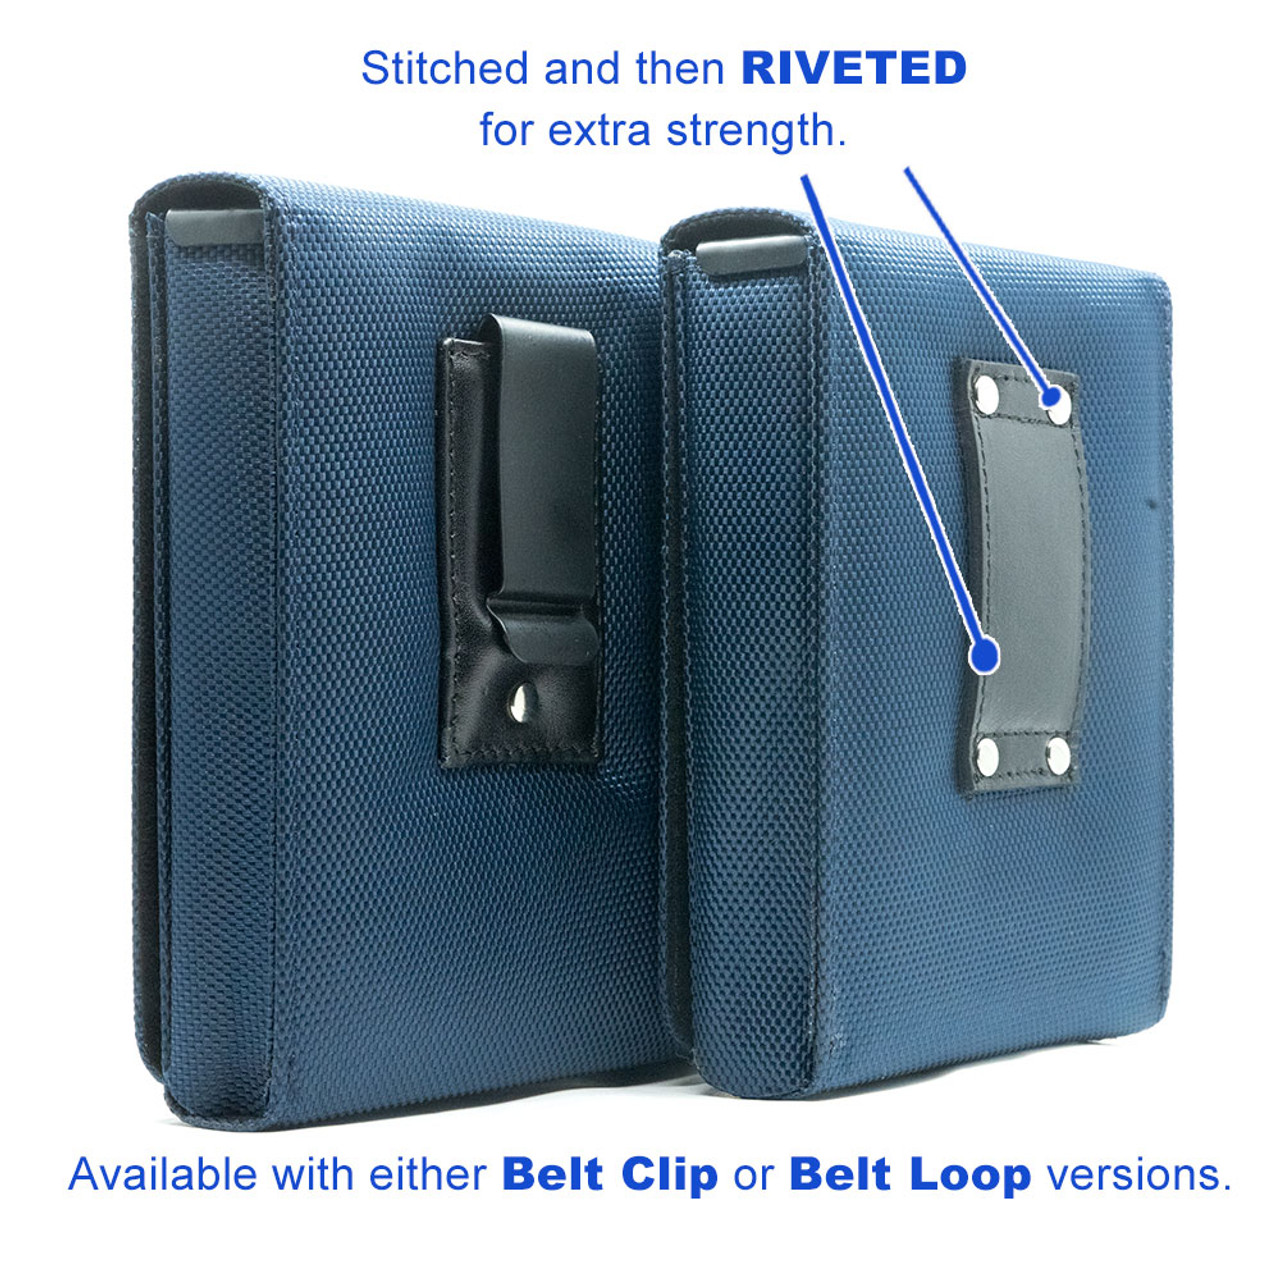 Colt Lightweight Defender Blue Covert Series Holster